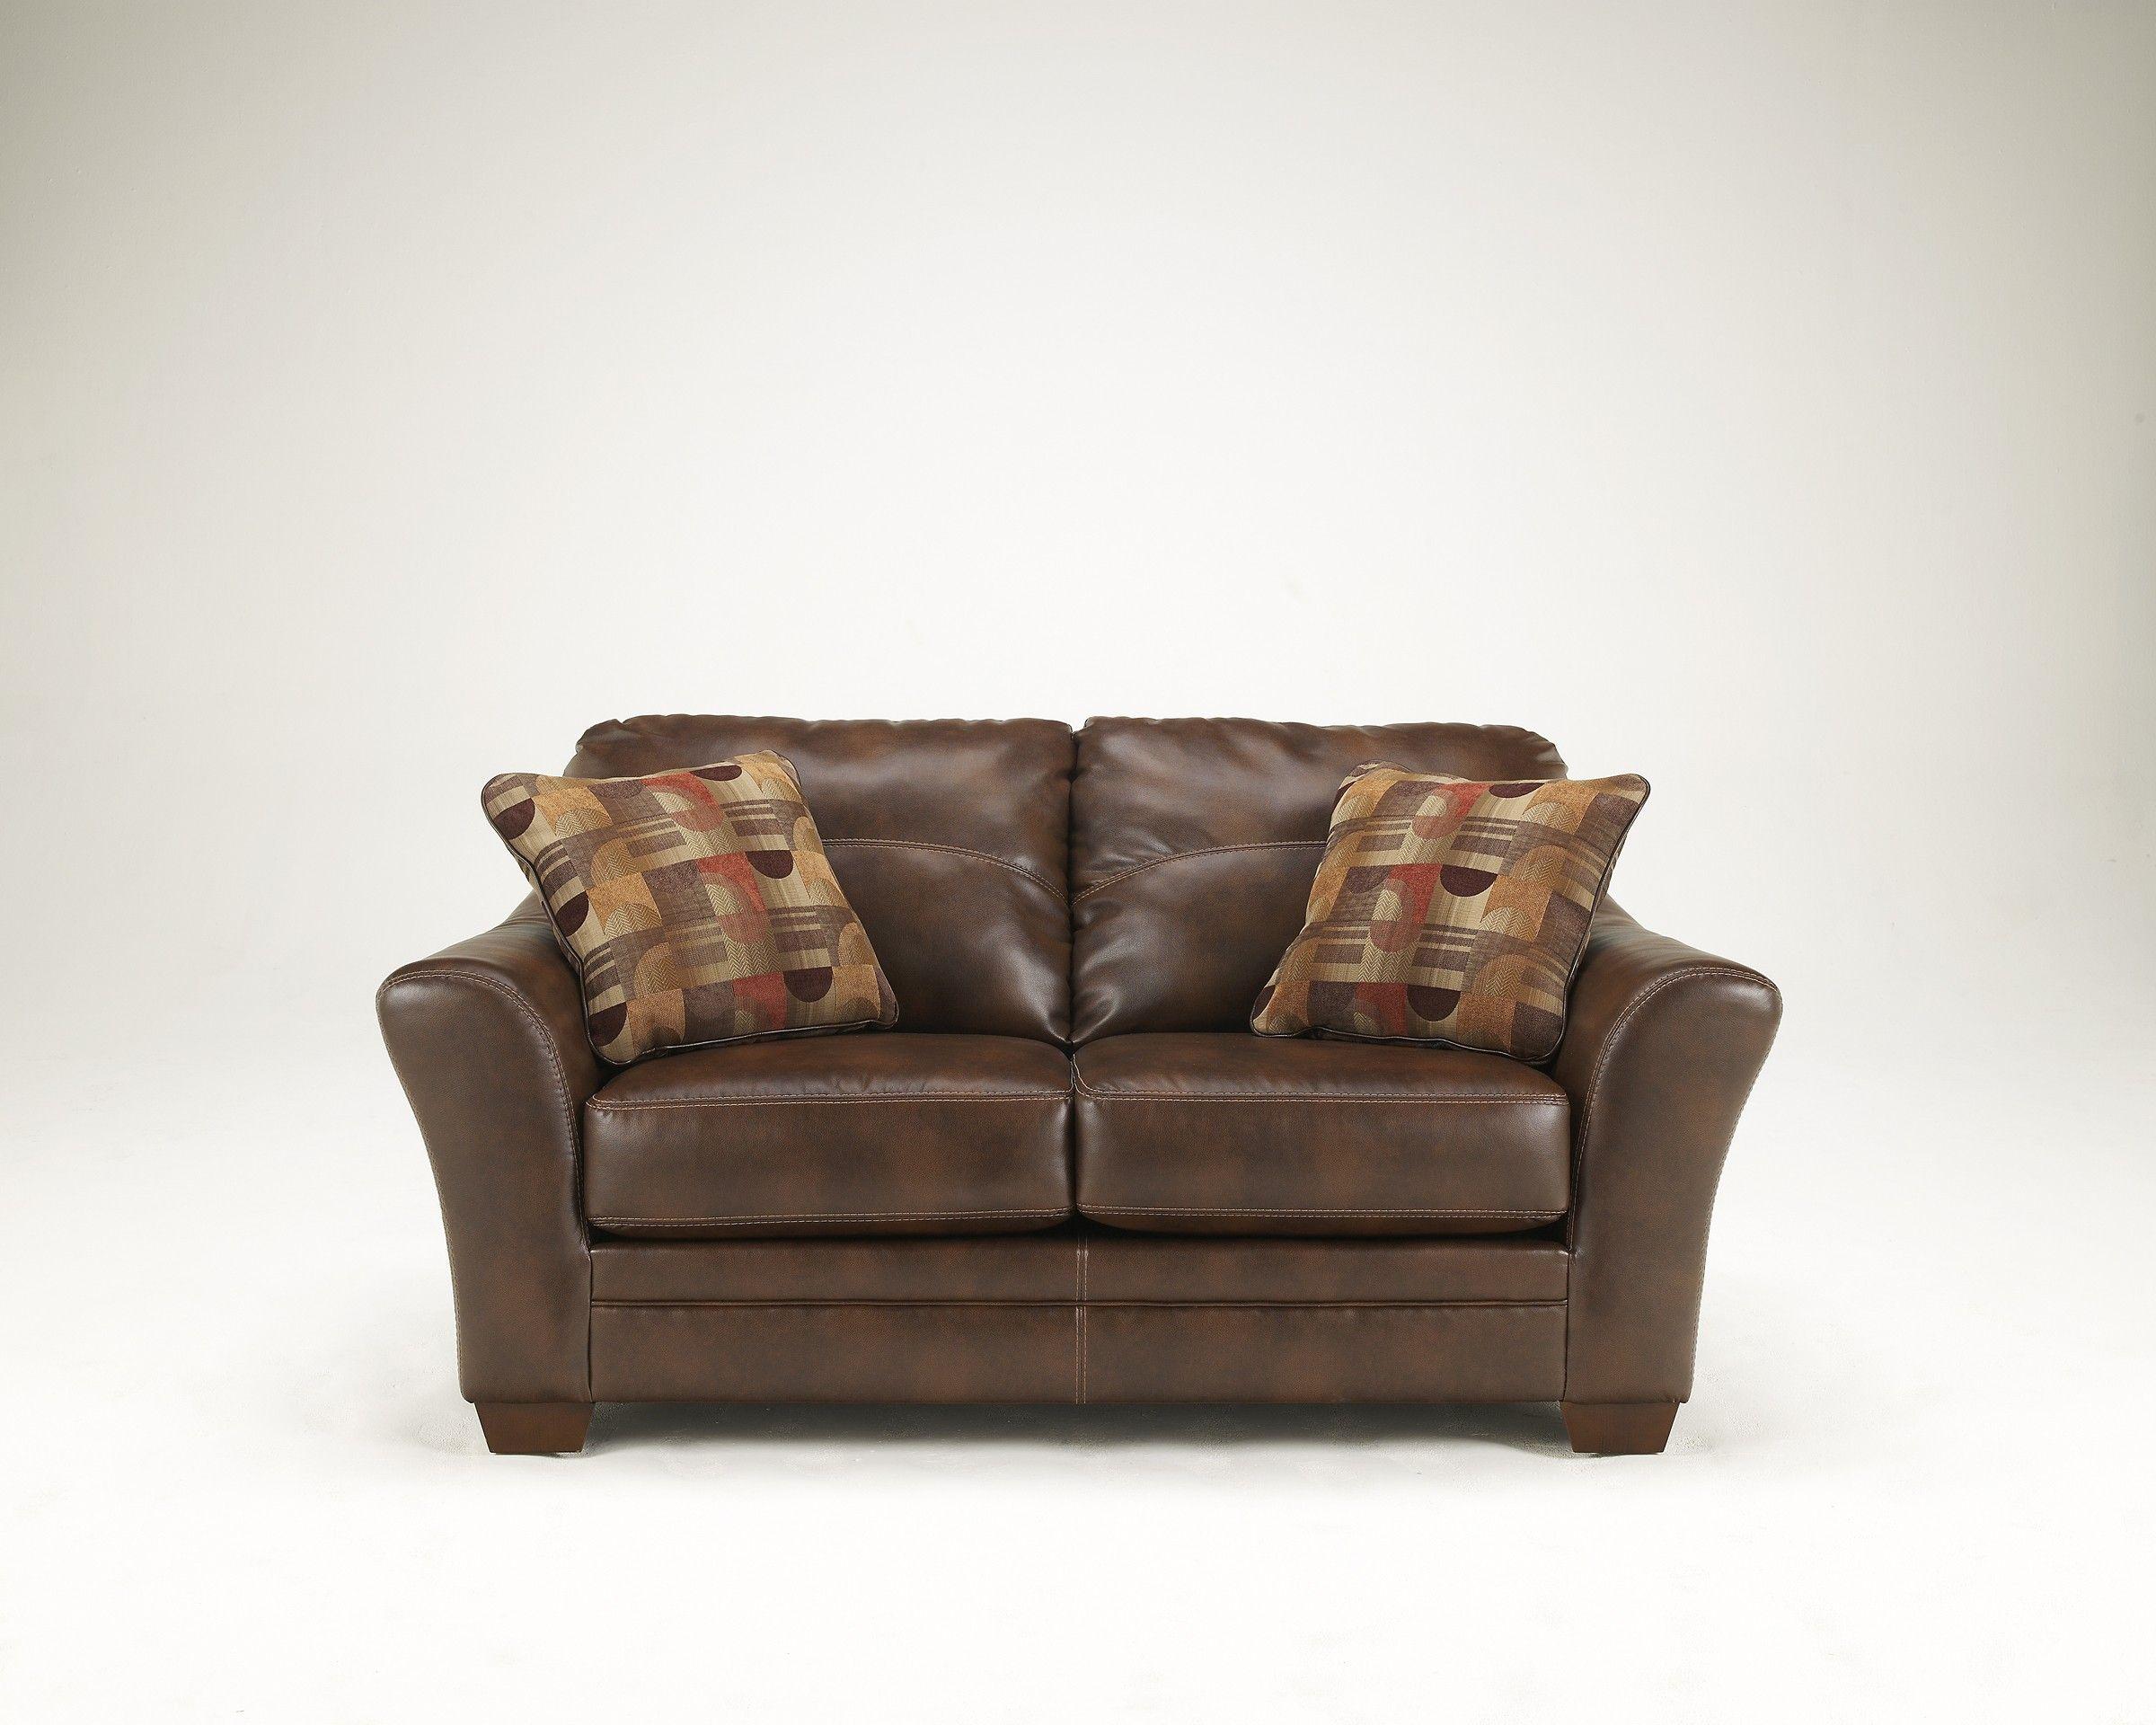 Ashley Del Rio Durablend 3920035 Signature Design Sedona Loveseat Love Seat Bed Furniture Signature Design